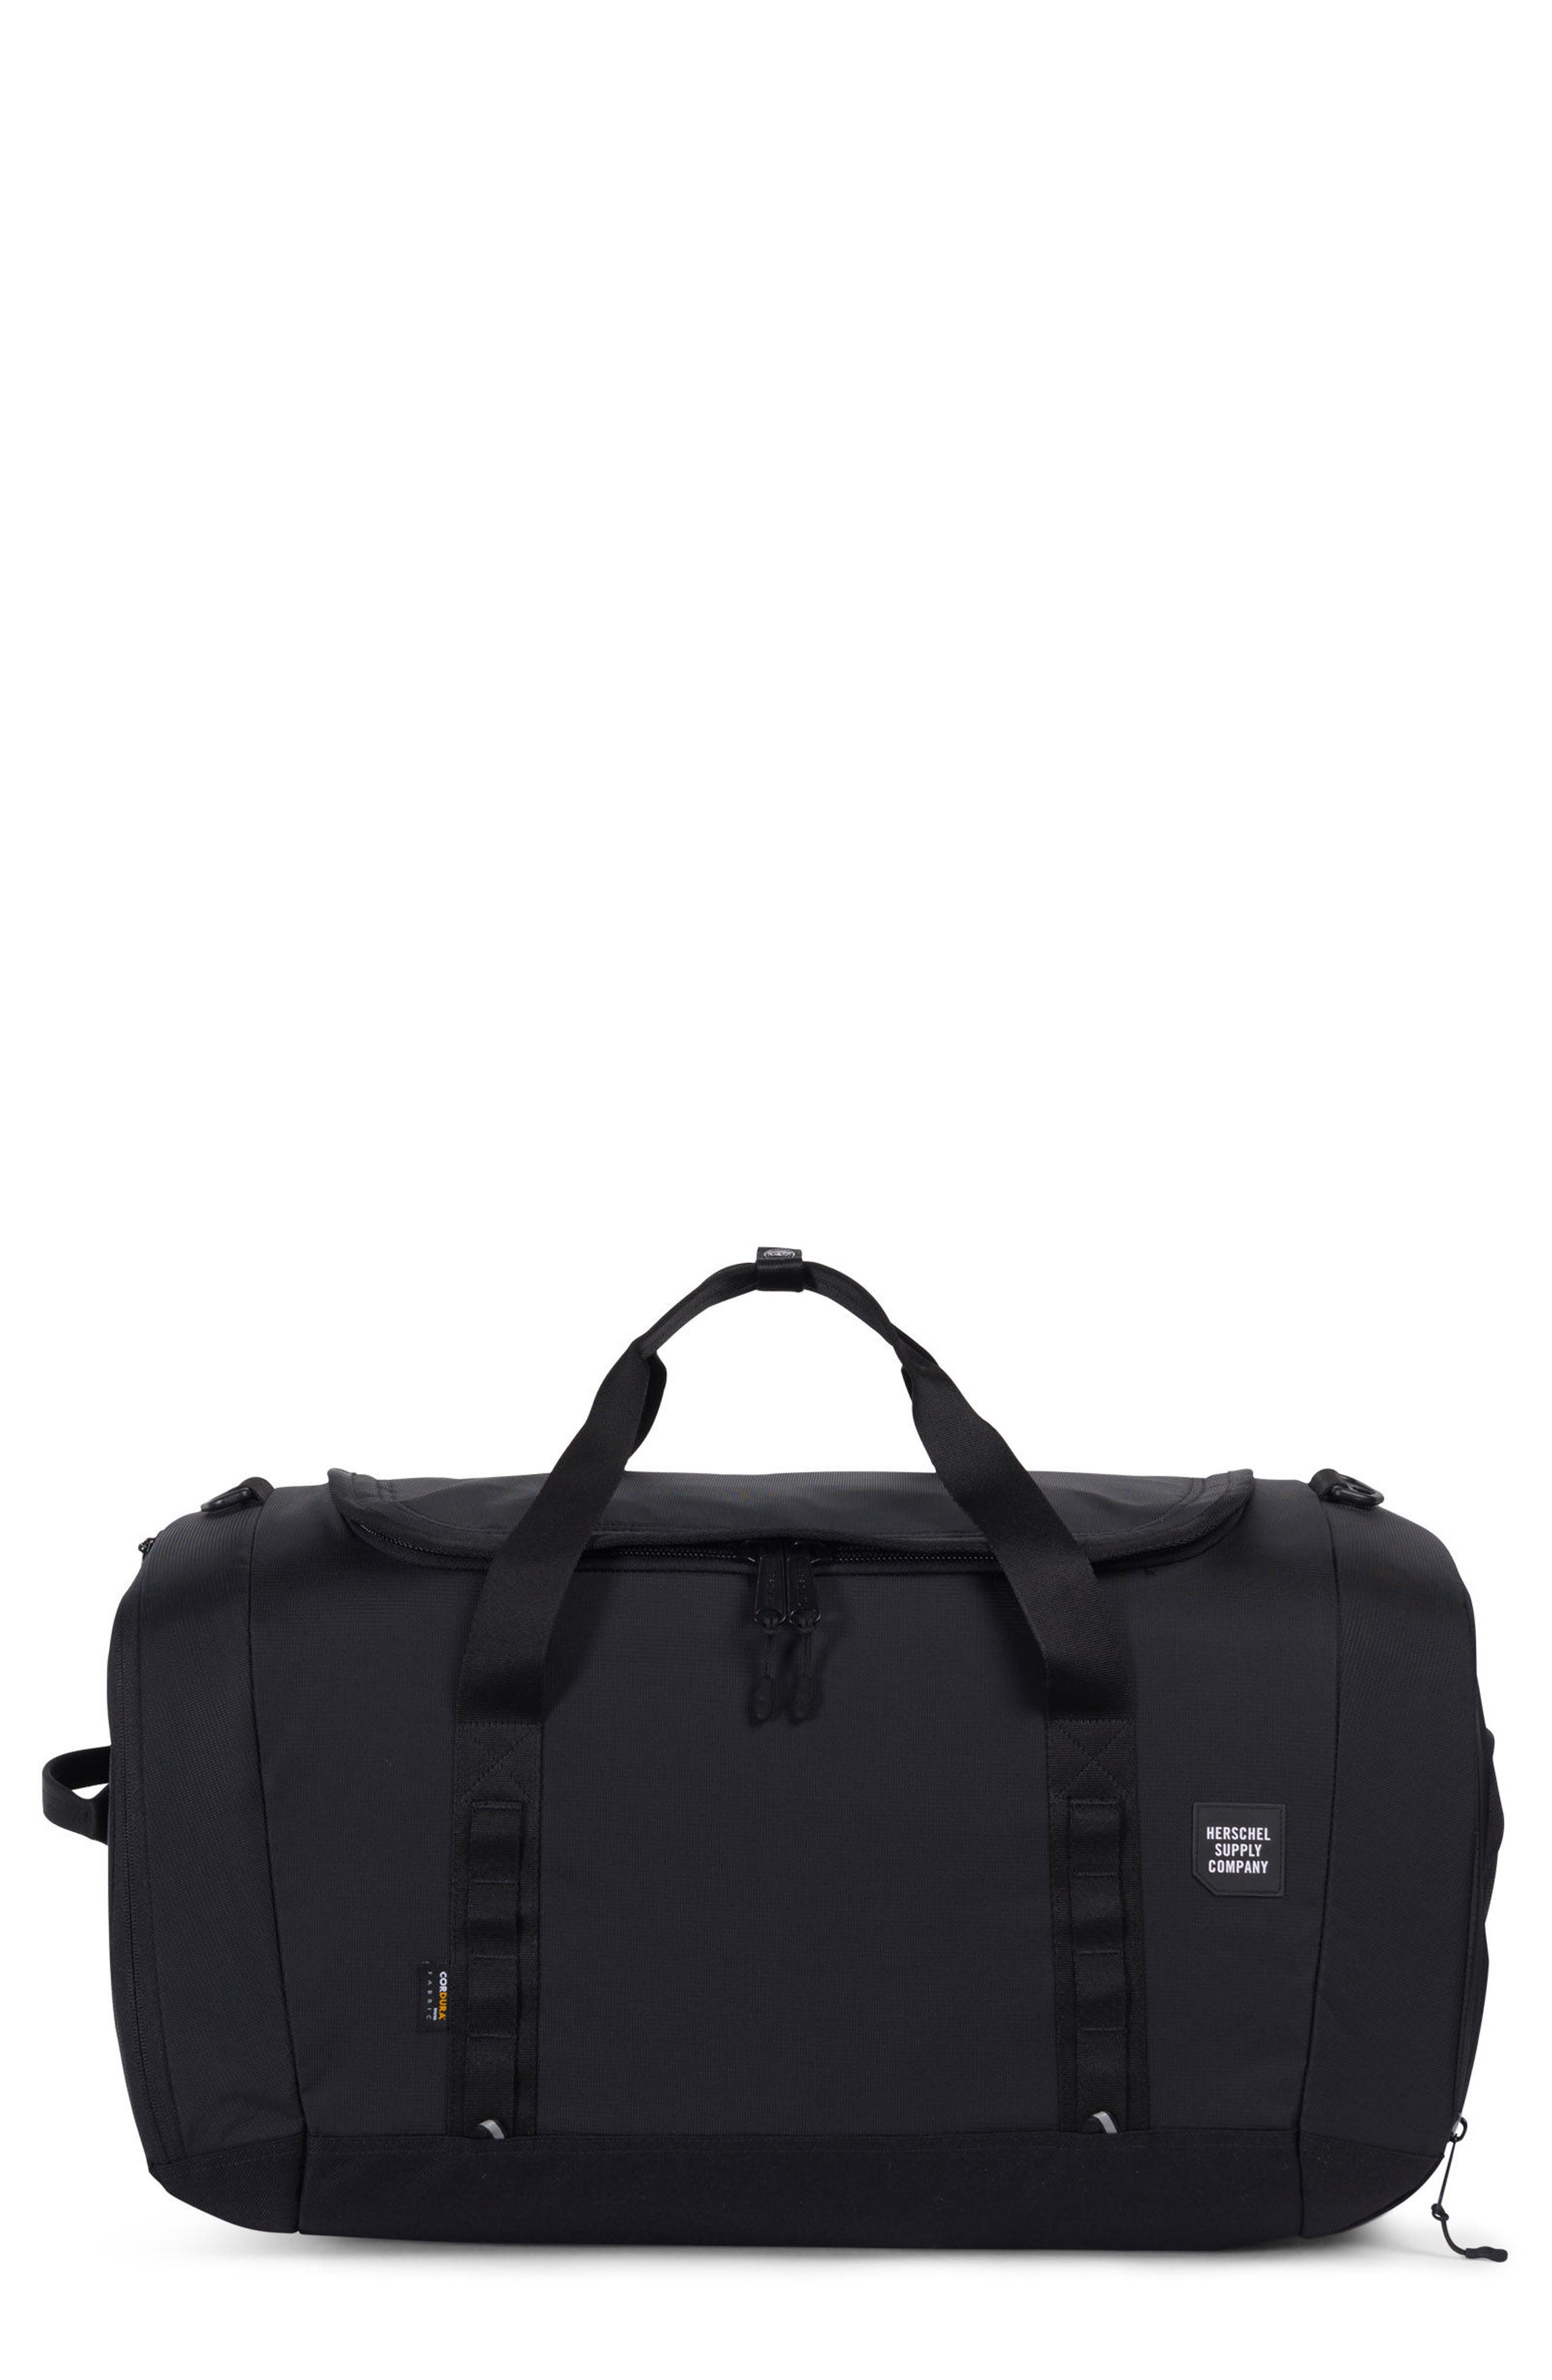 Trail Gorge Duffel Bag,                         Main,                         color, Black